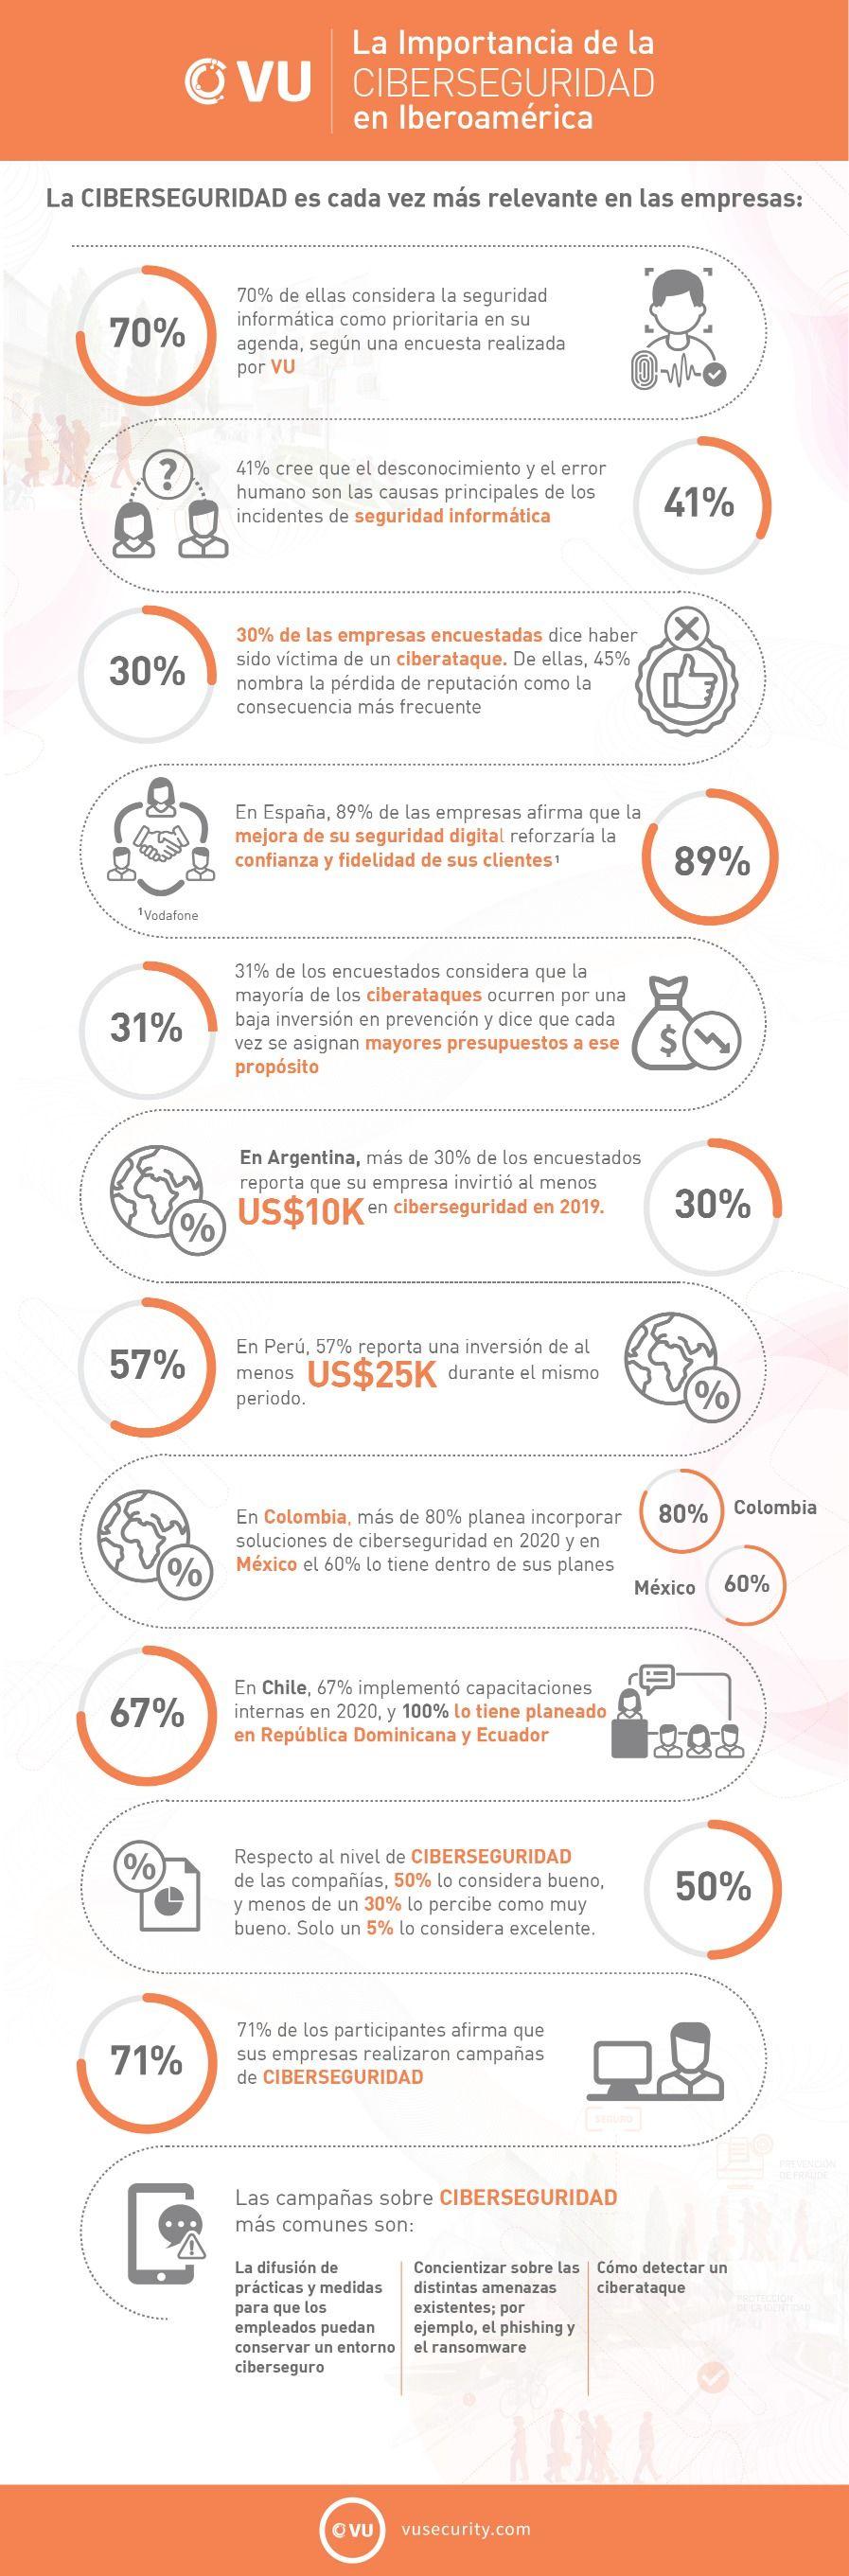 Primera conferencia Iberoamericana sobre ciberseguridad